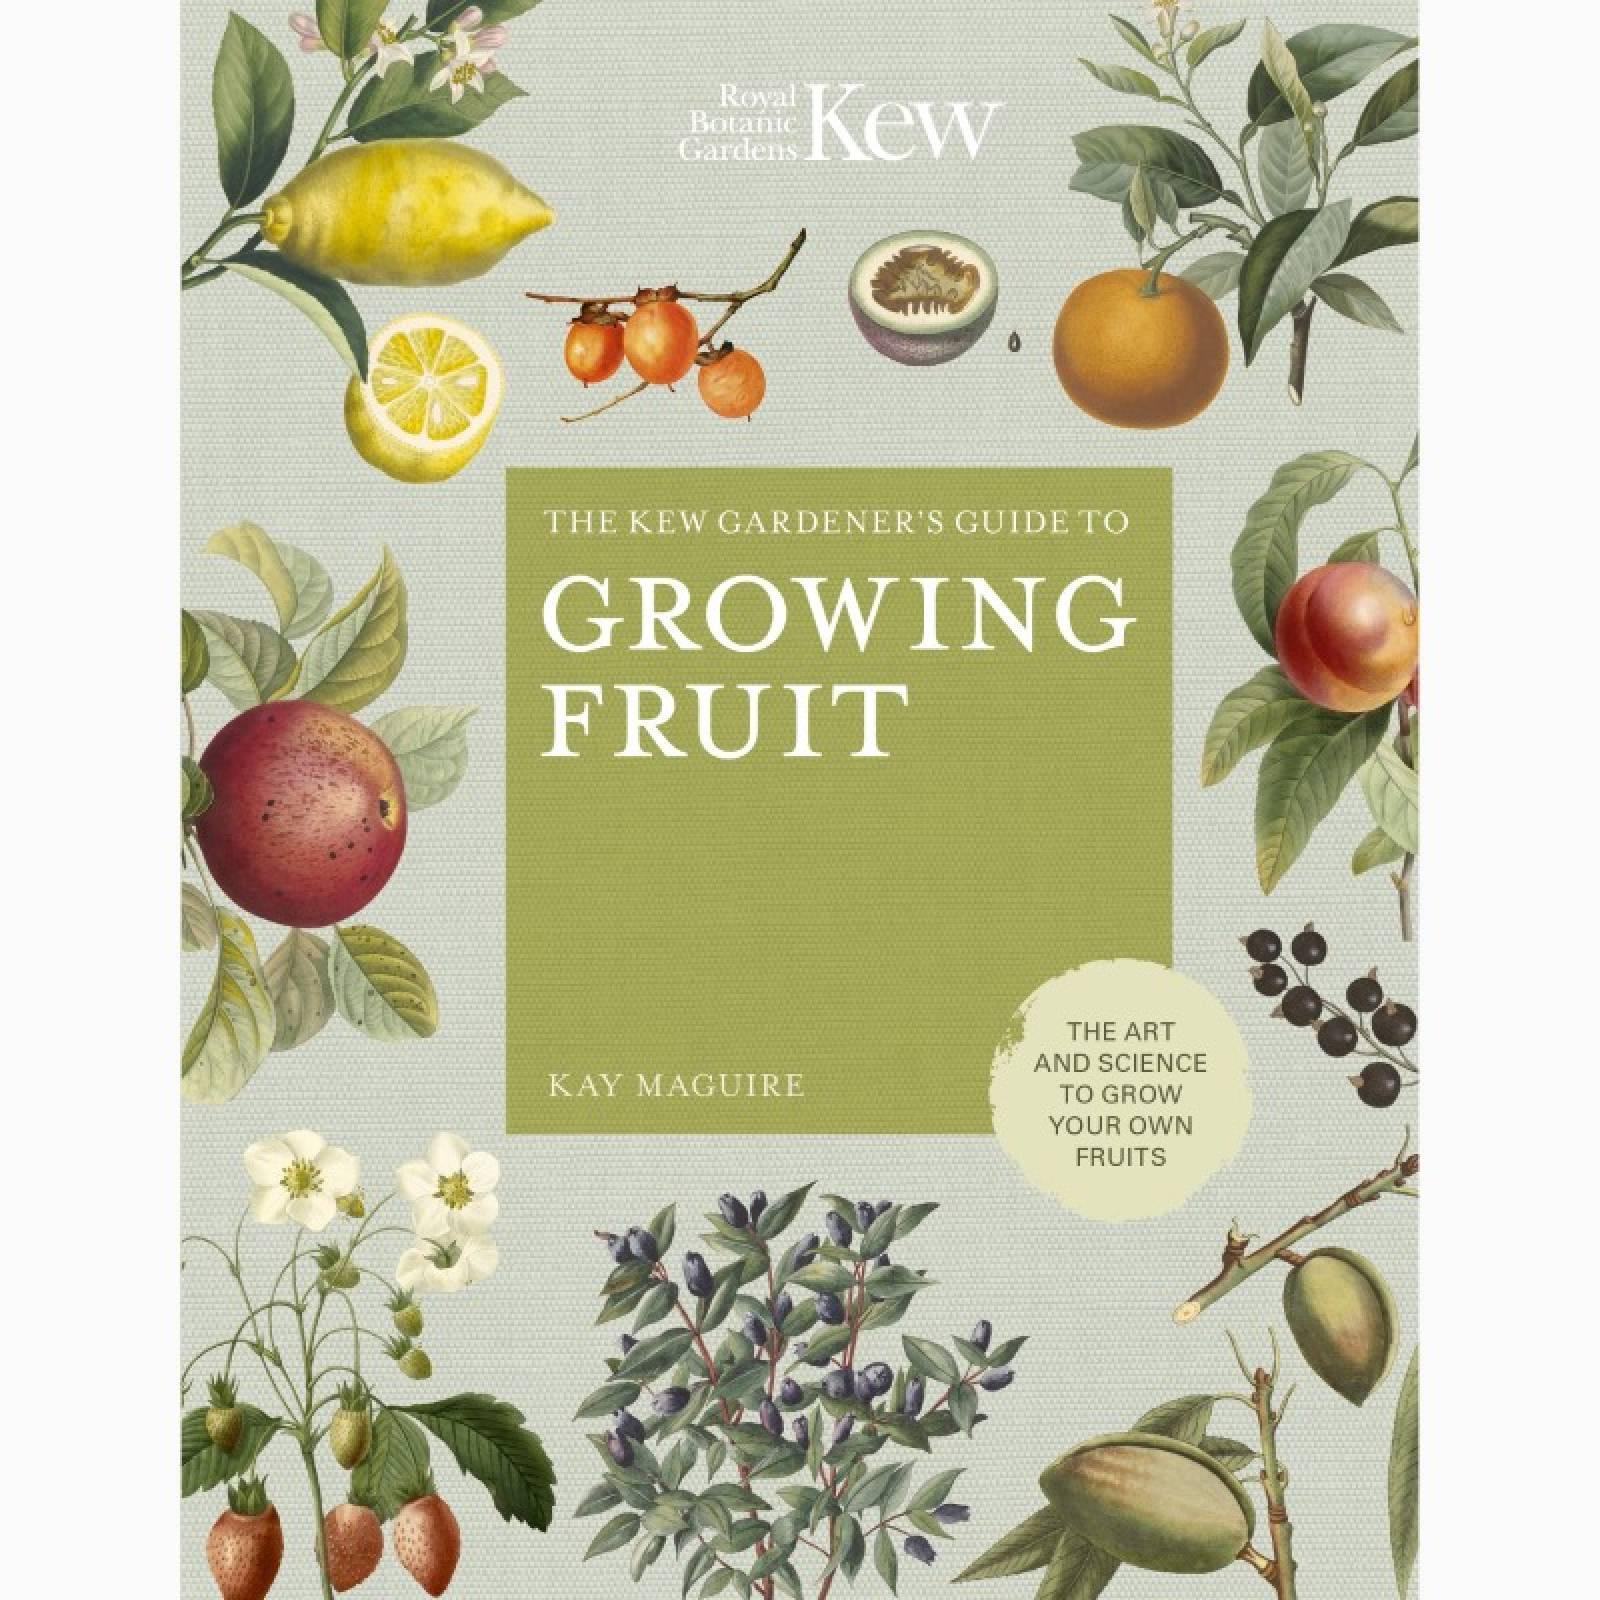 The Kew Gardener's Guide to Growing Fruit - Hardback Book